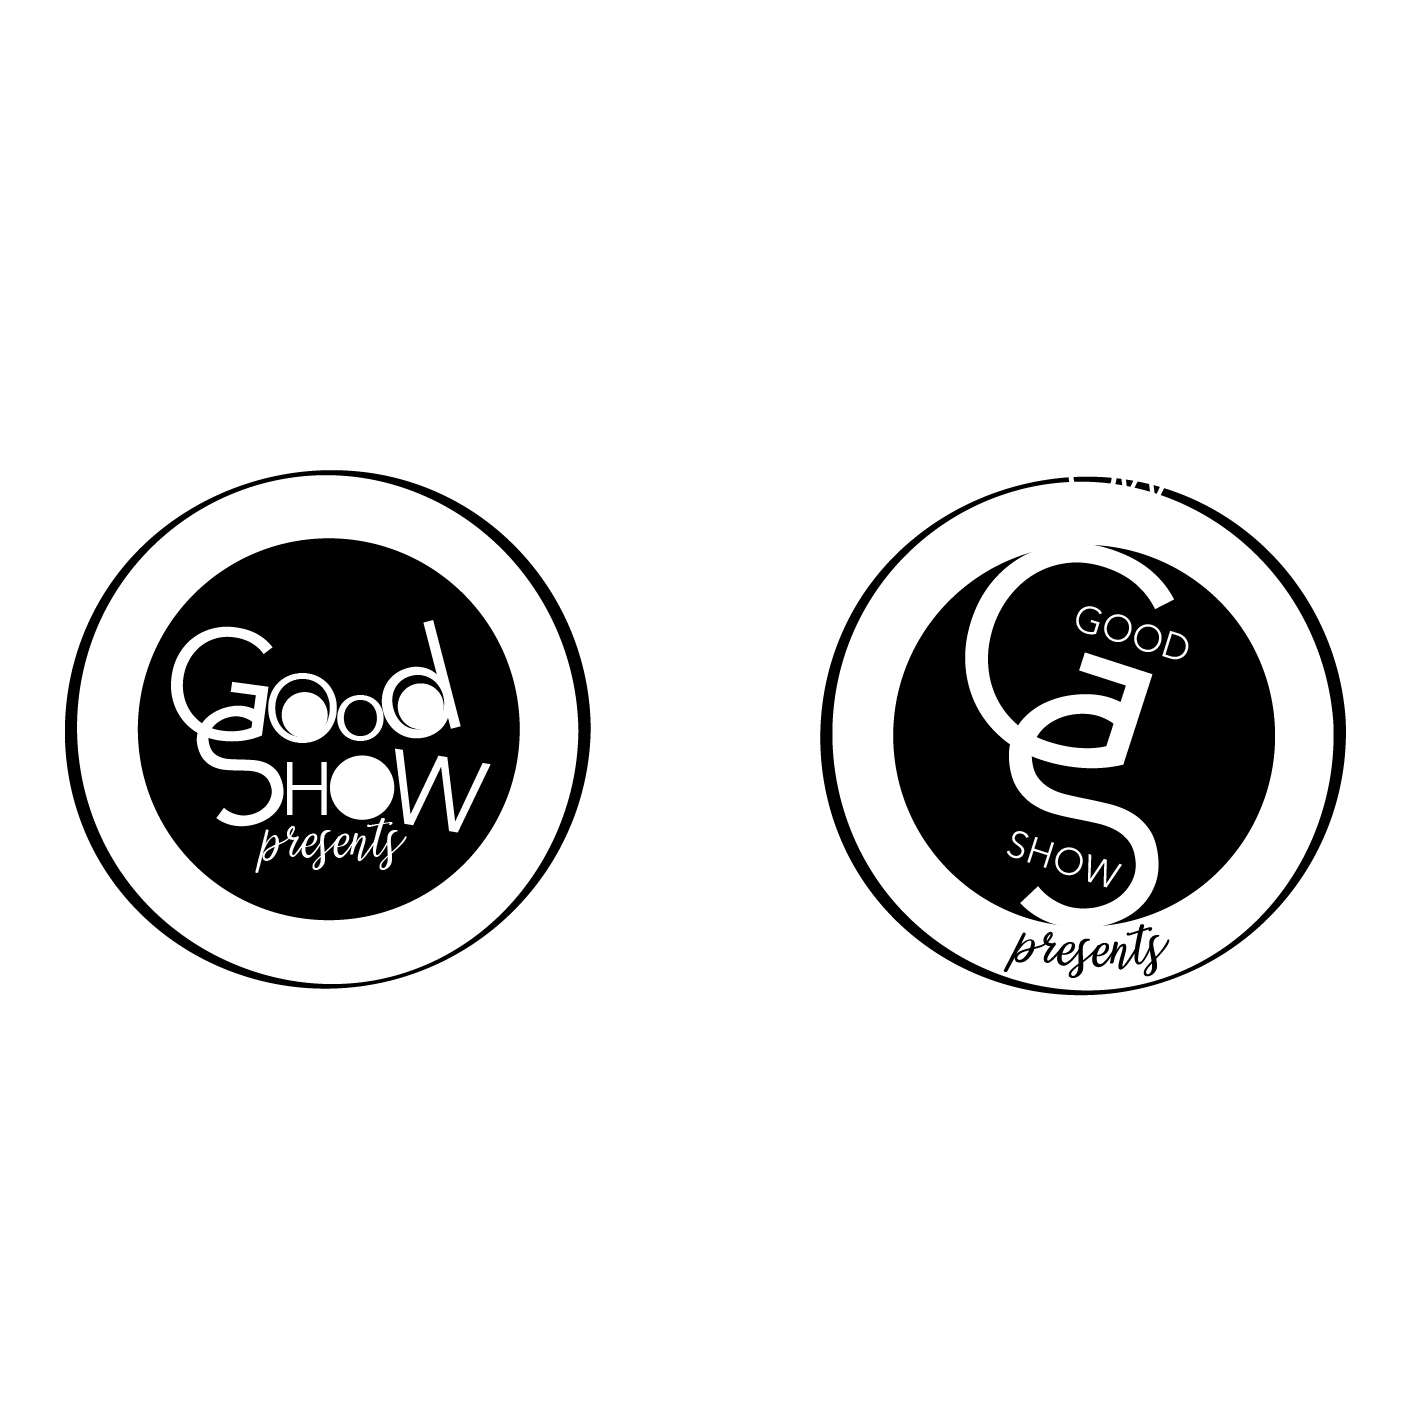 Preview logo-04.jpg